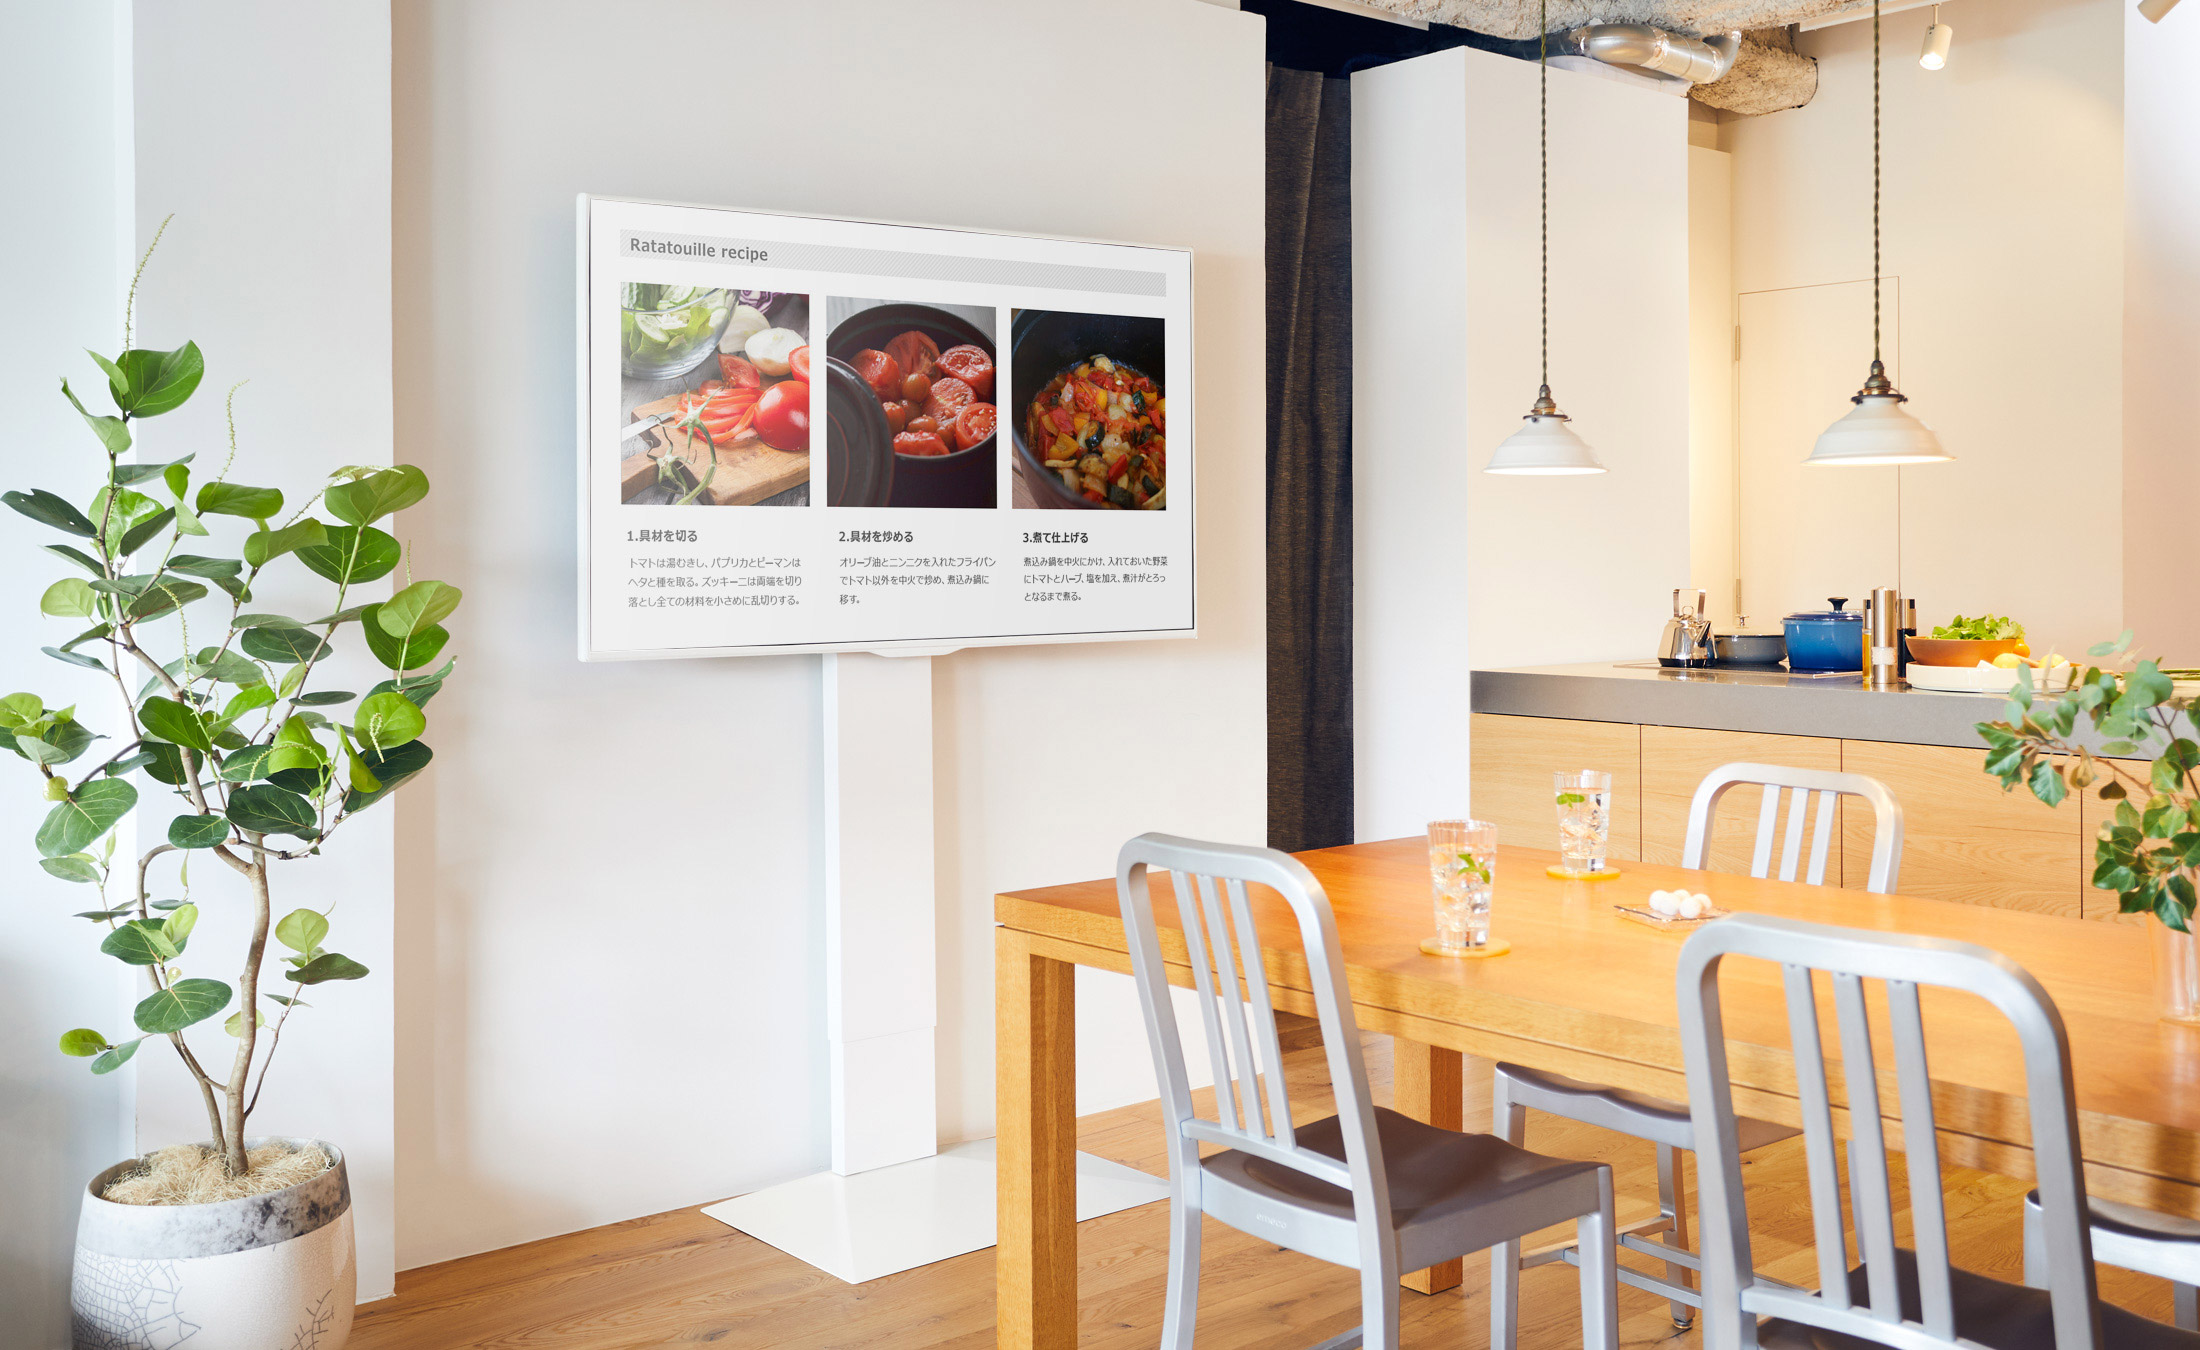 WALL INTERIOR TV STAND V3 壁寄せテレビスタンドV3 DINING & KITCHEN 2枚目